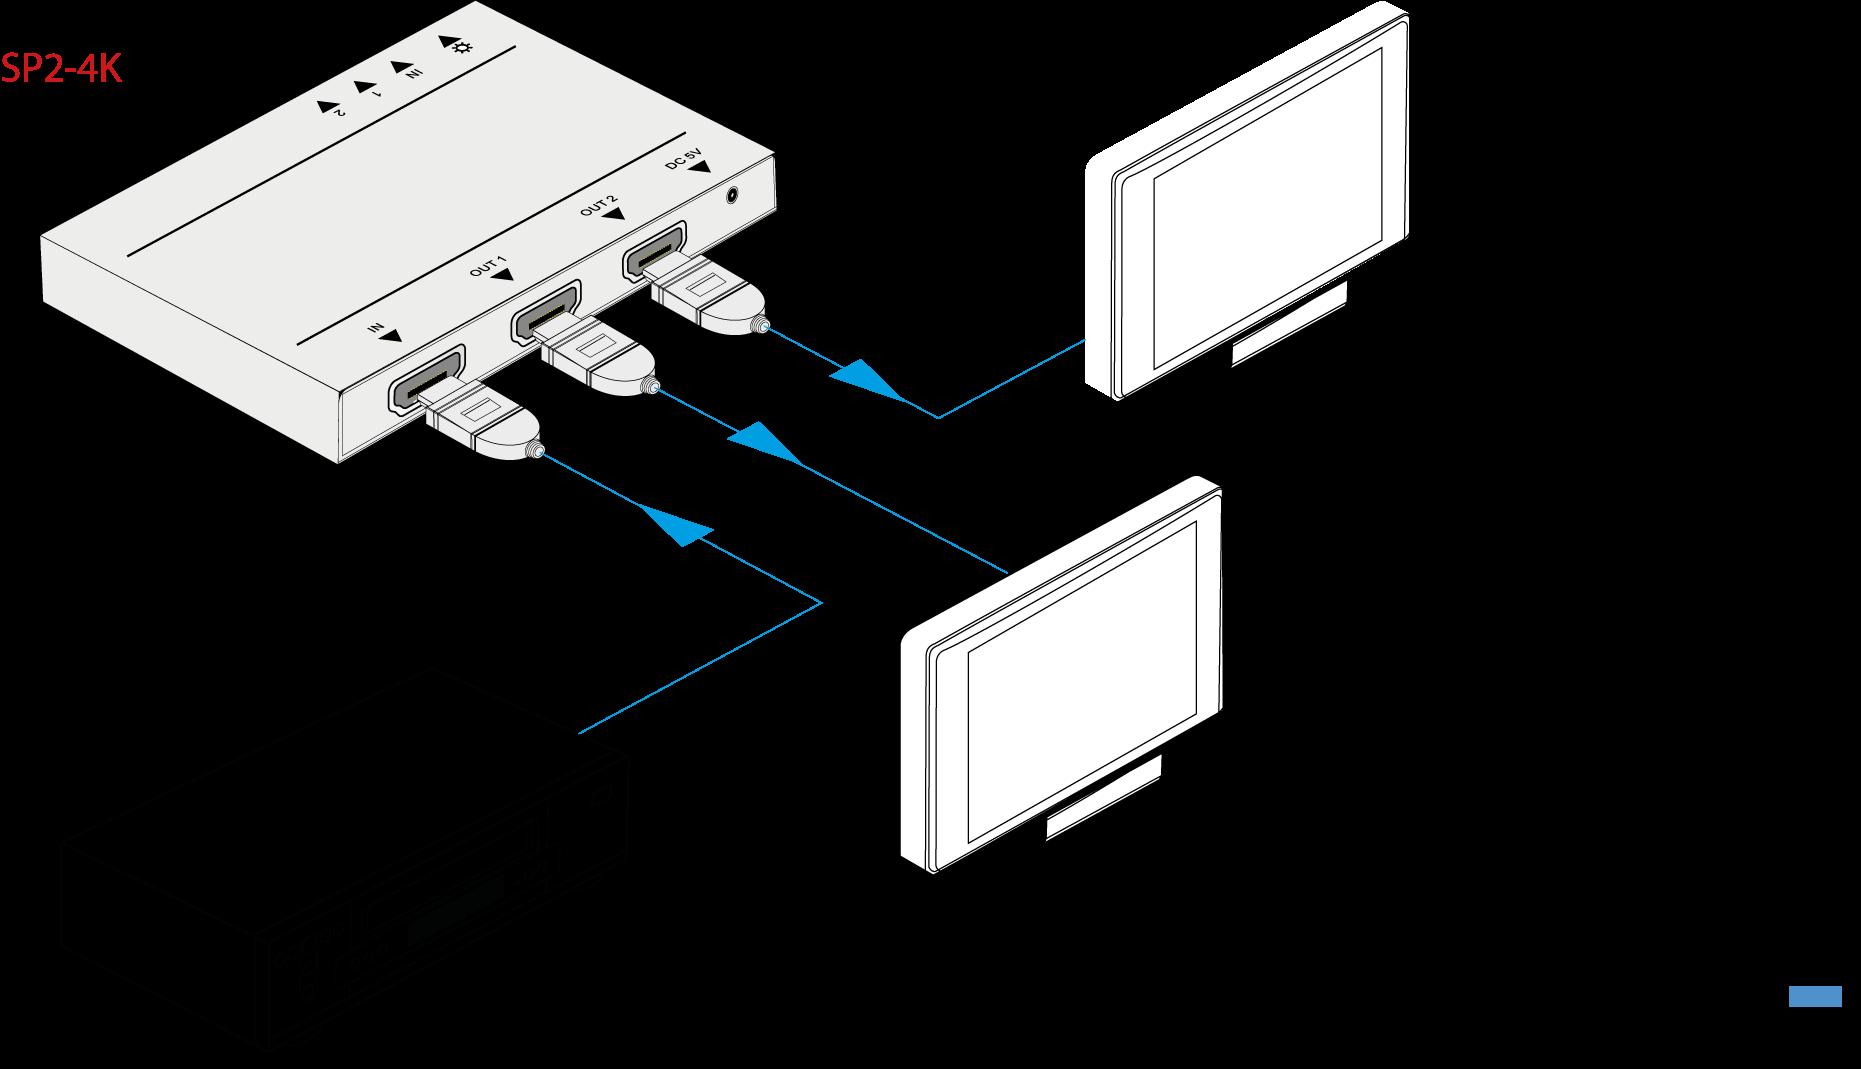 SP2-4K | Distributeur HDMI 1x2 extra plat